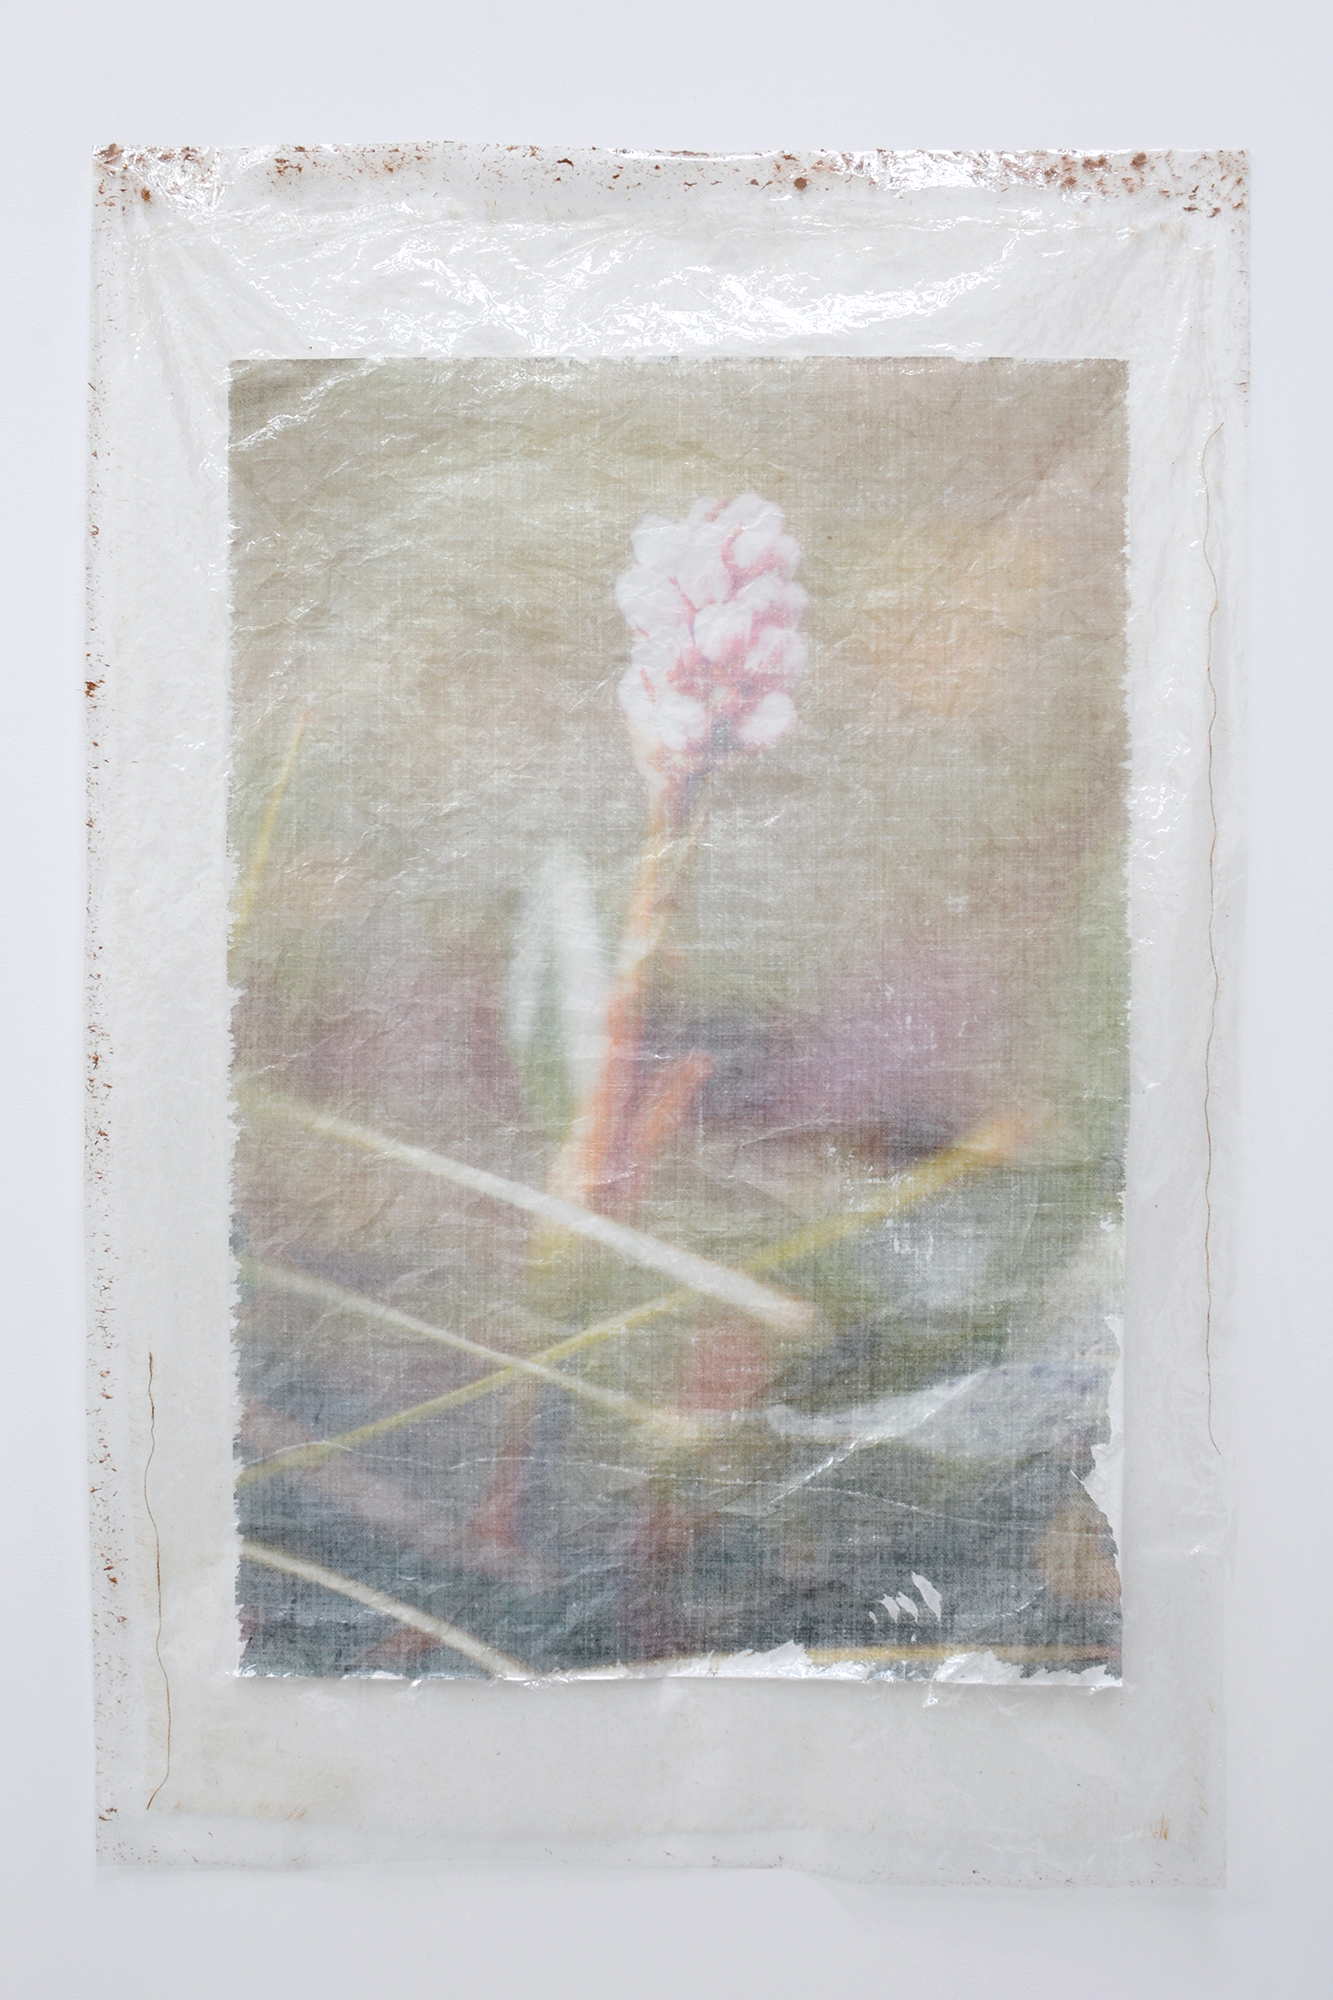 Valerie Snobeck, Dennis' Flower (parting) , 2013, peeled print and burlap on plastic, 149 x 97cm